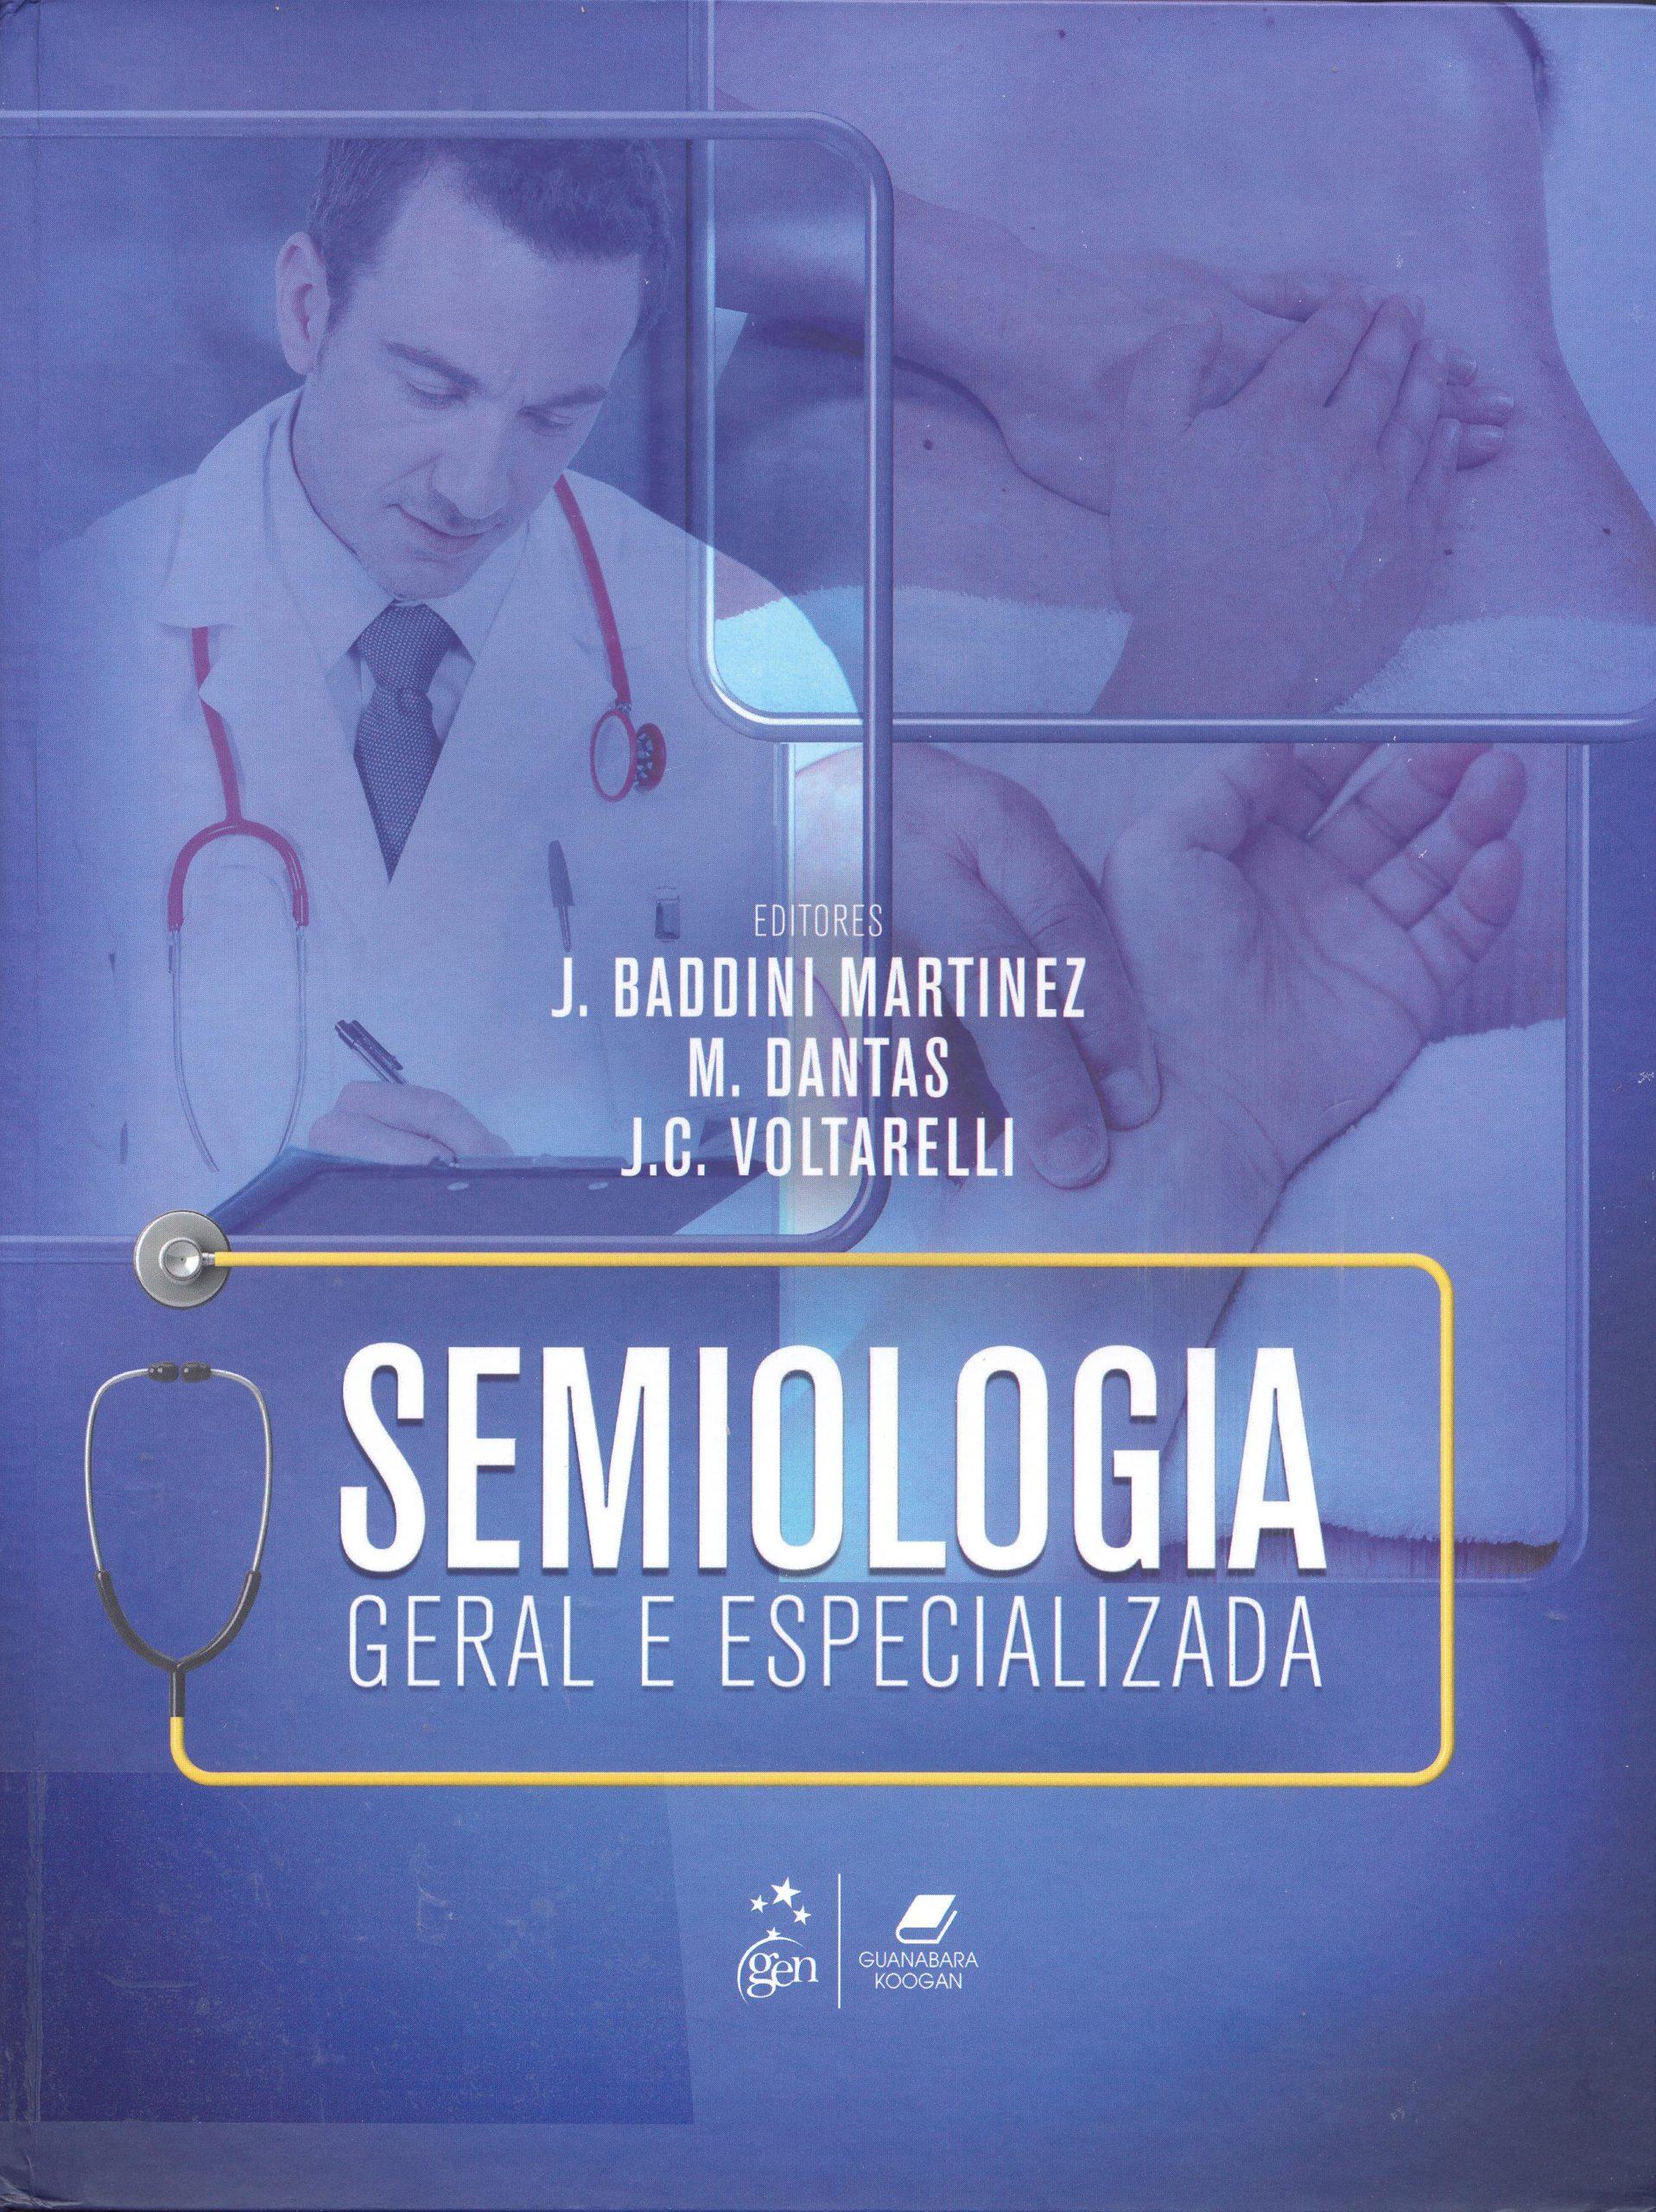 semiologia geral e especializada 001